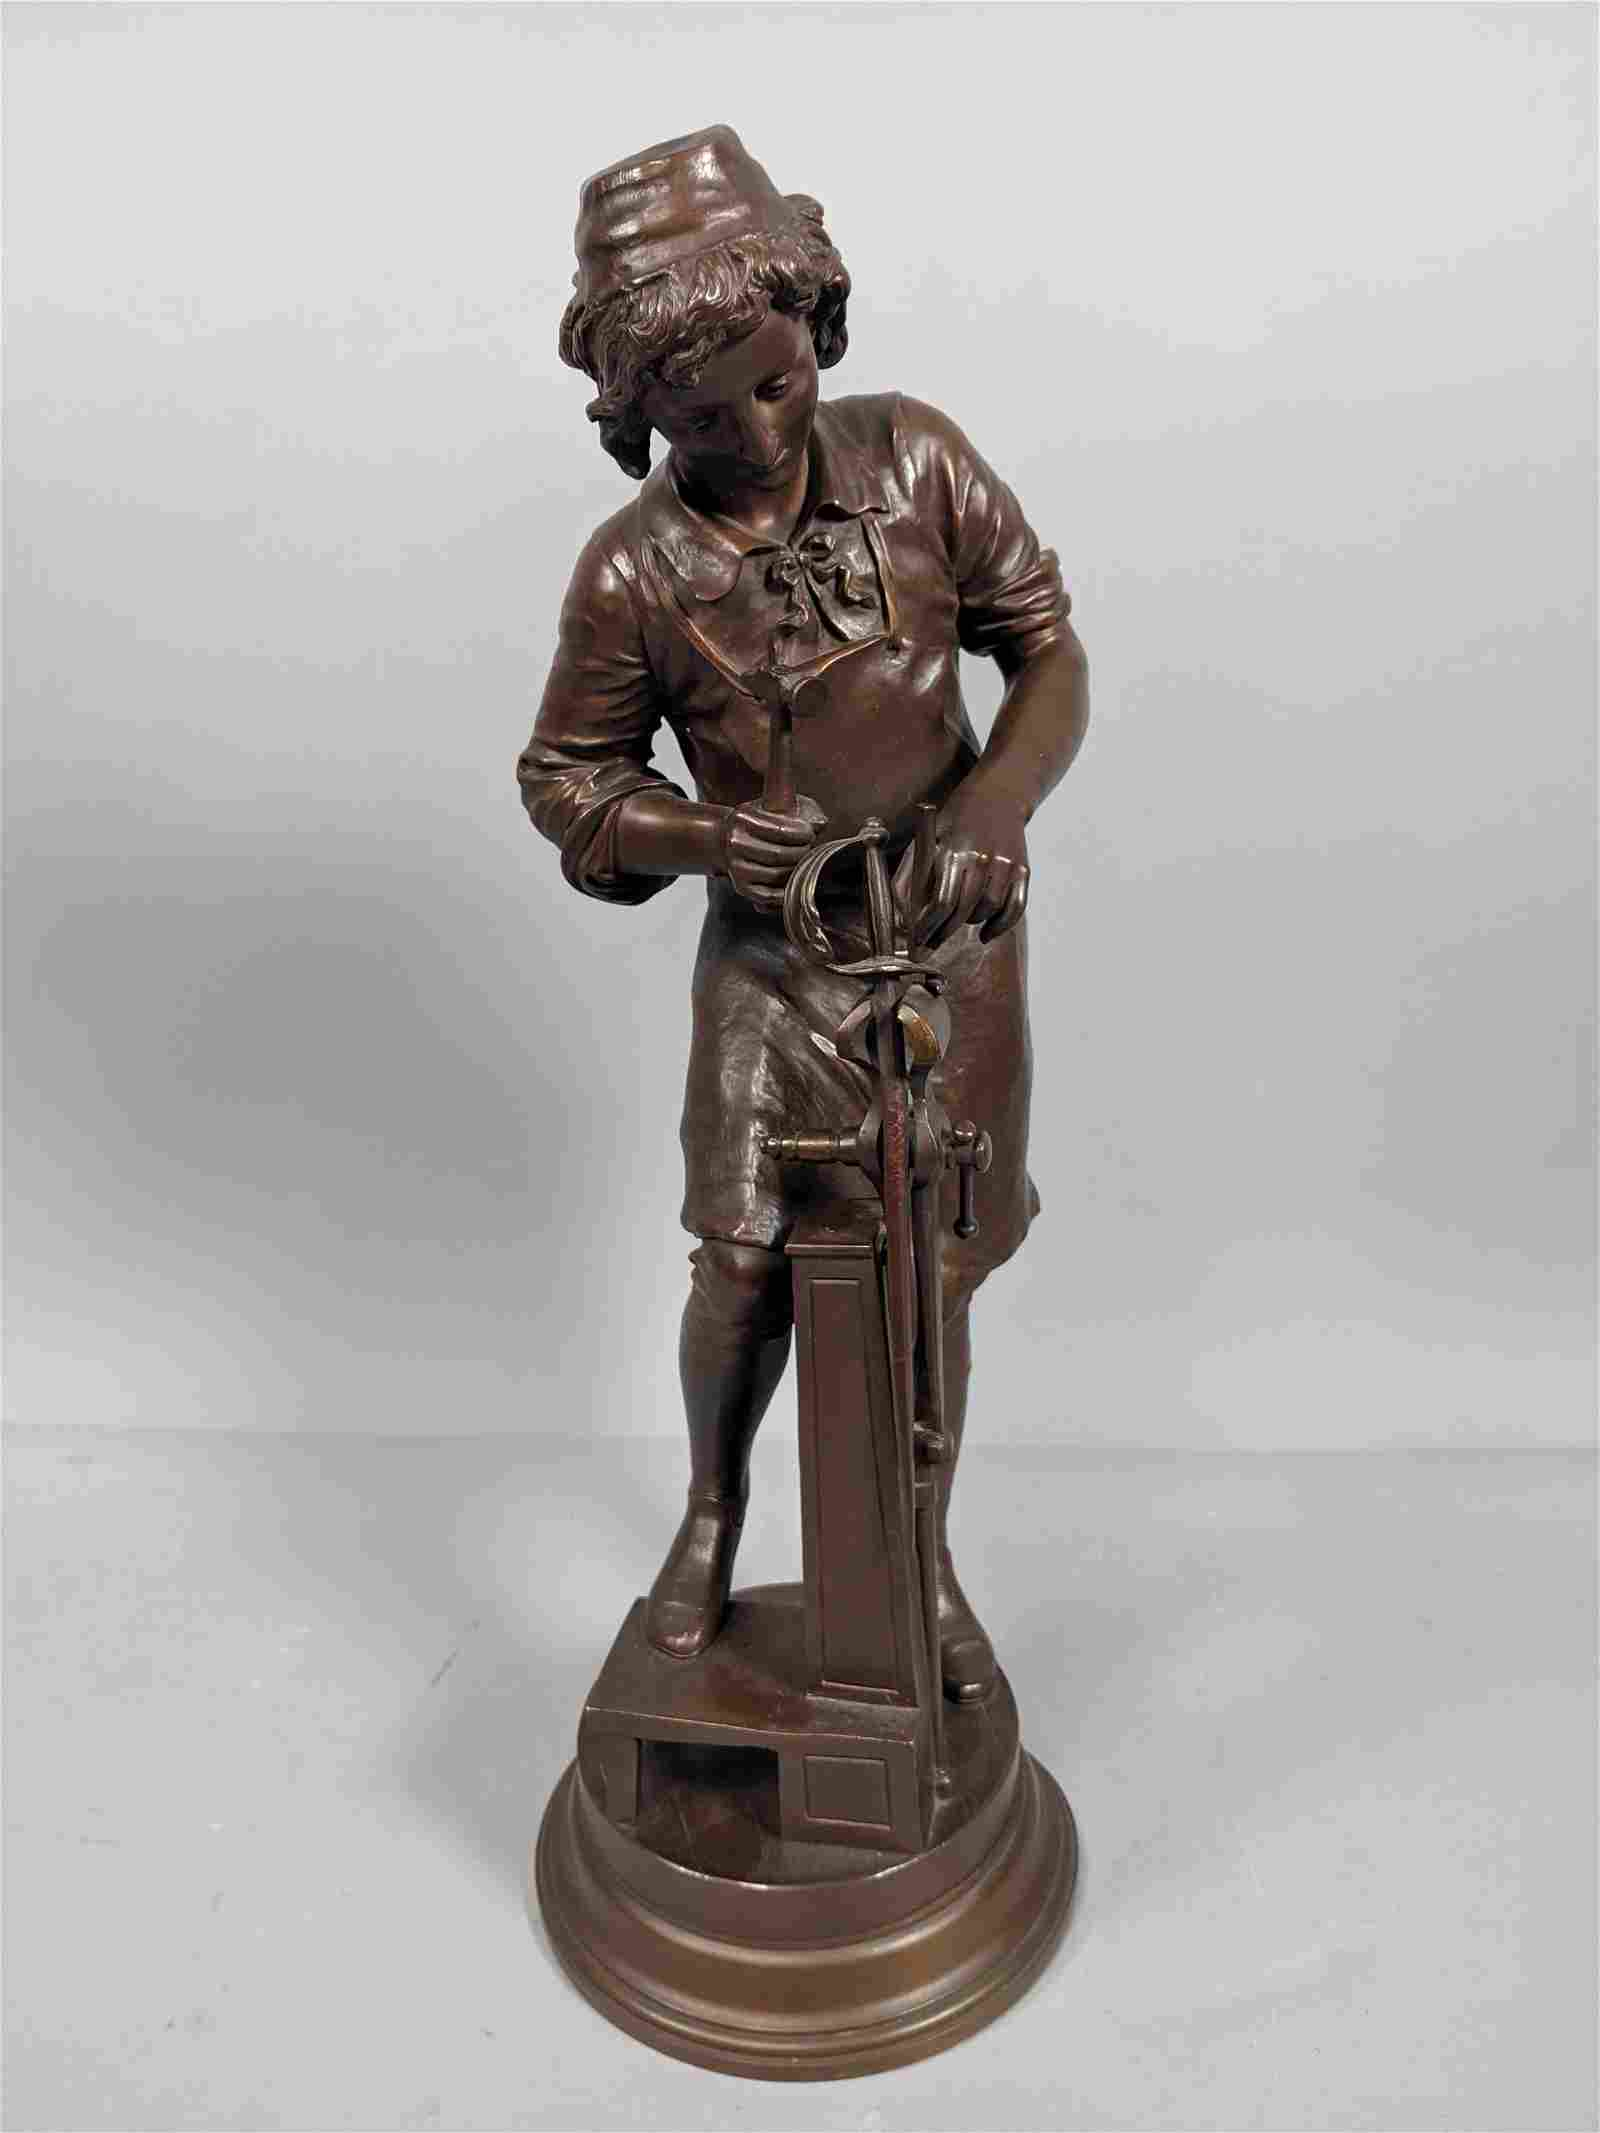 Antique Bronze Figural Sculpture of Swordsmith.